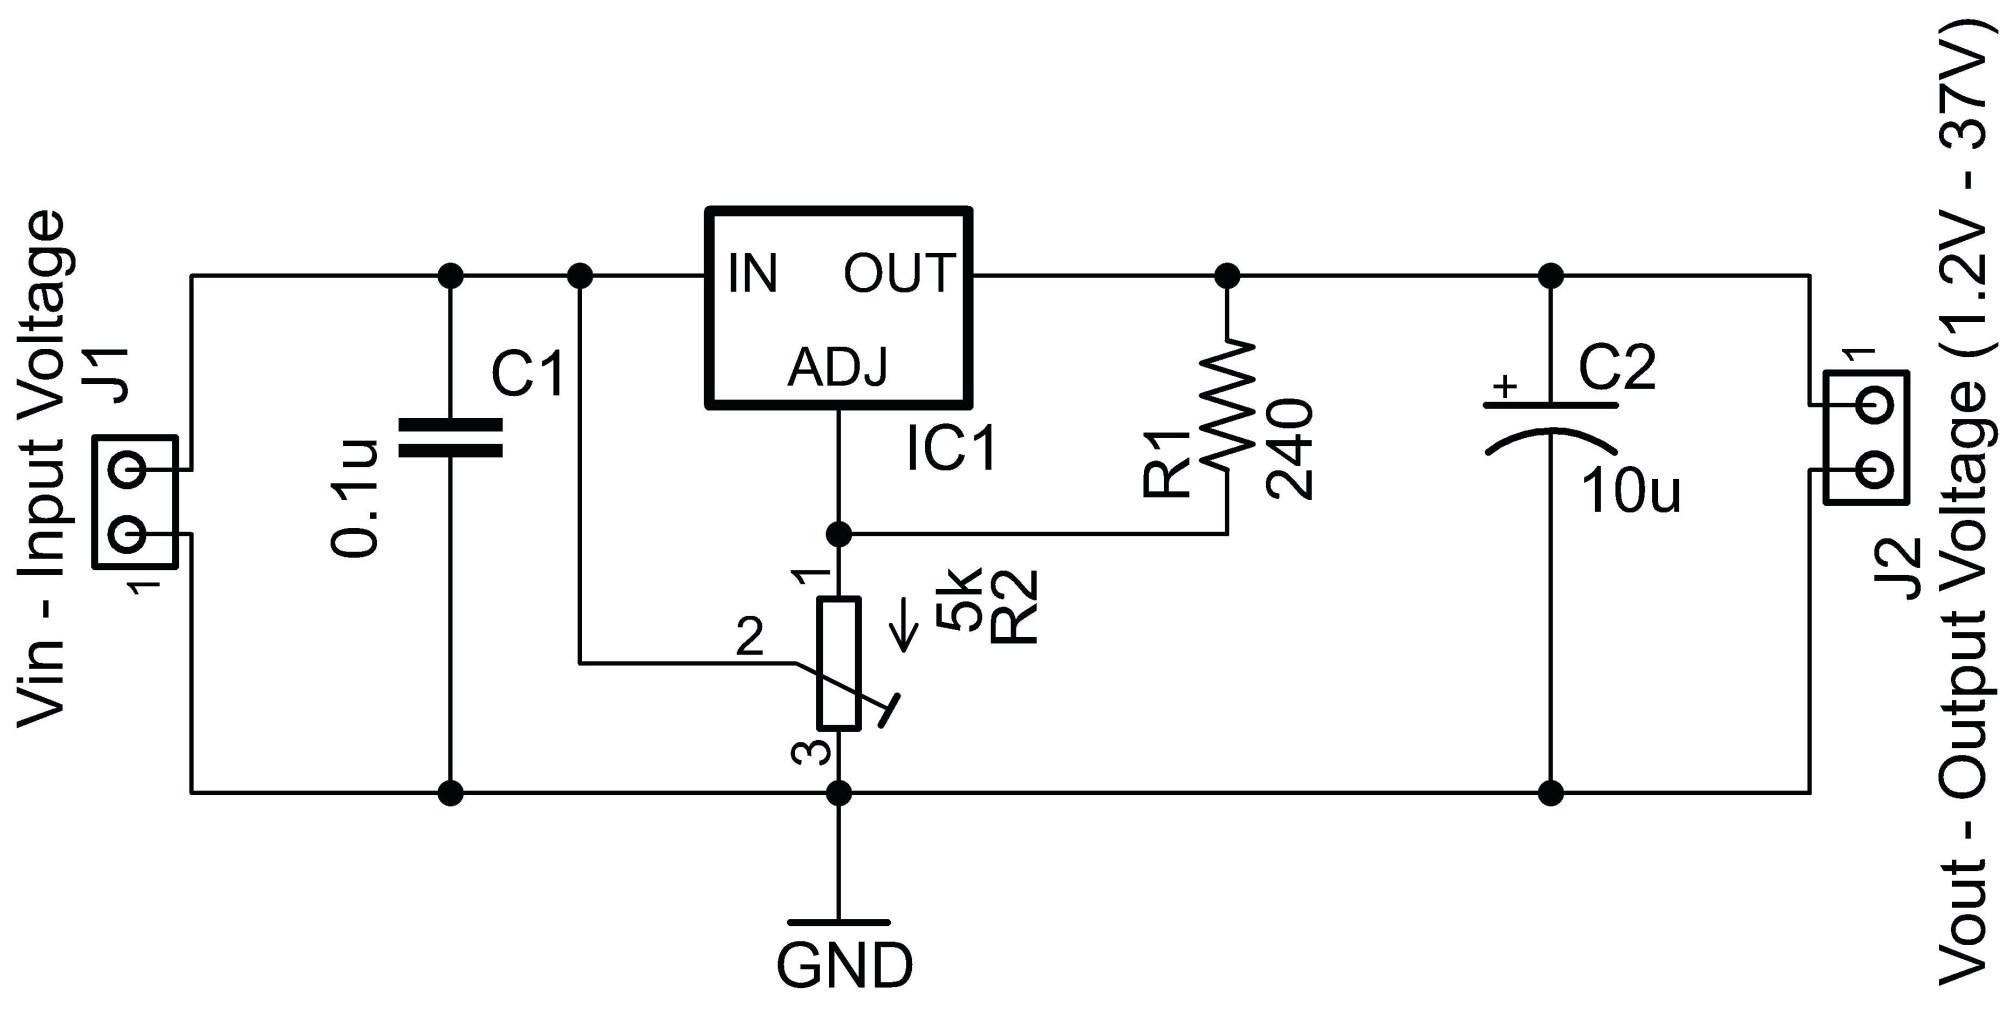 hight resolution of alternator wiring diagram w terminal new alternator wiring diagram external regulator typical and voltage